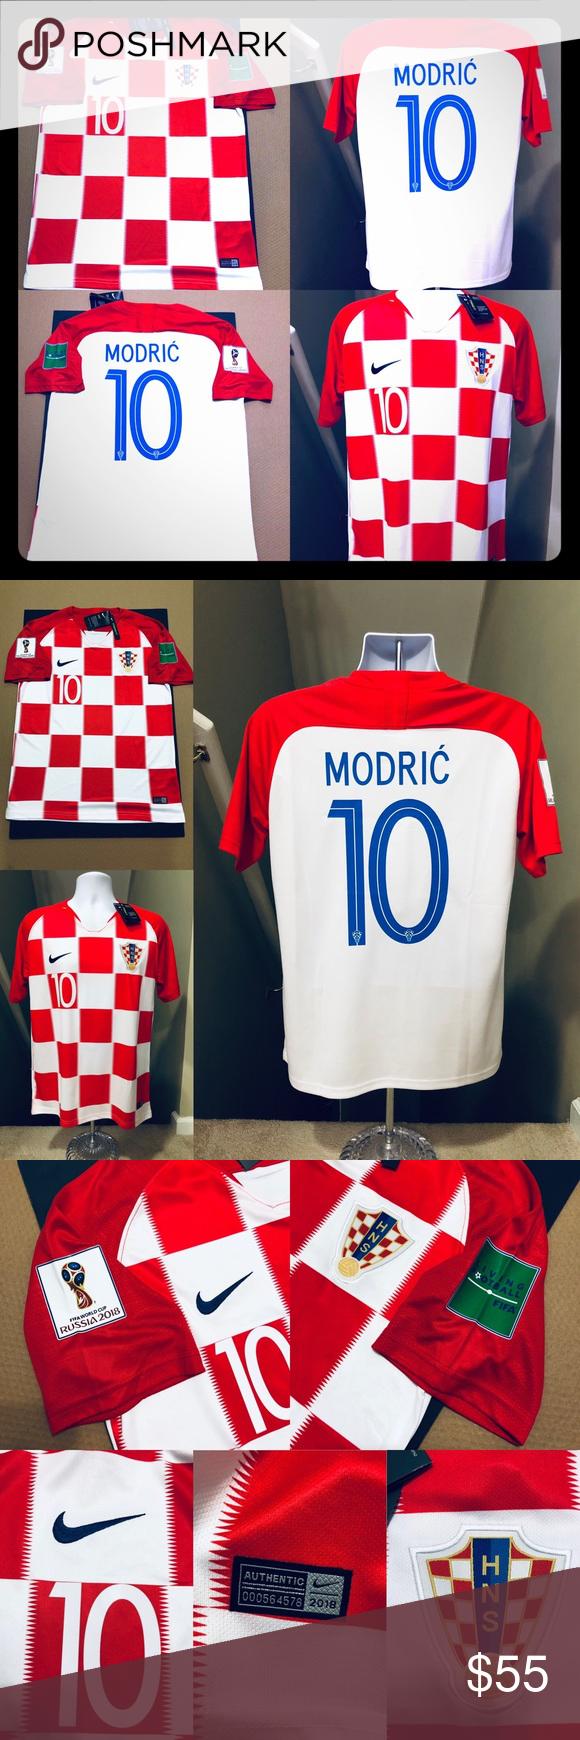 5318a4263 2018 Modric  10 ⚽ World Cup Croatia Soccer Jersey 2018 Croatia National  Football Team • Futbol Soccer Jersey Football 2018 Home Croatia Soccer  Jersey ...